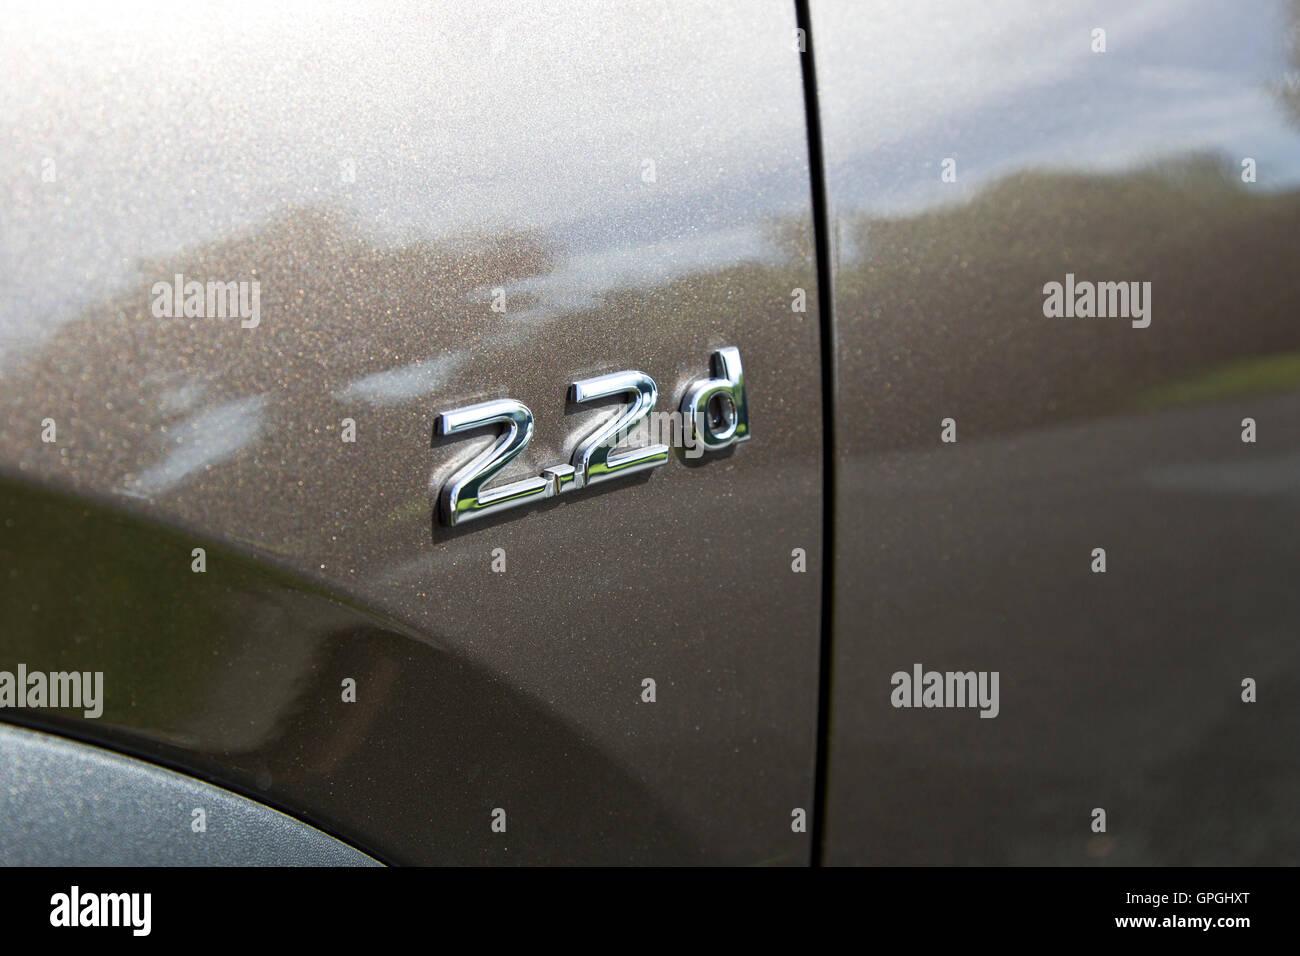 2.2d badge Infiniti chestnut bronze QX30 car. - Stock Image